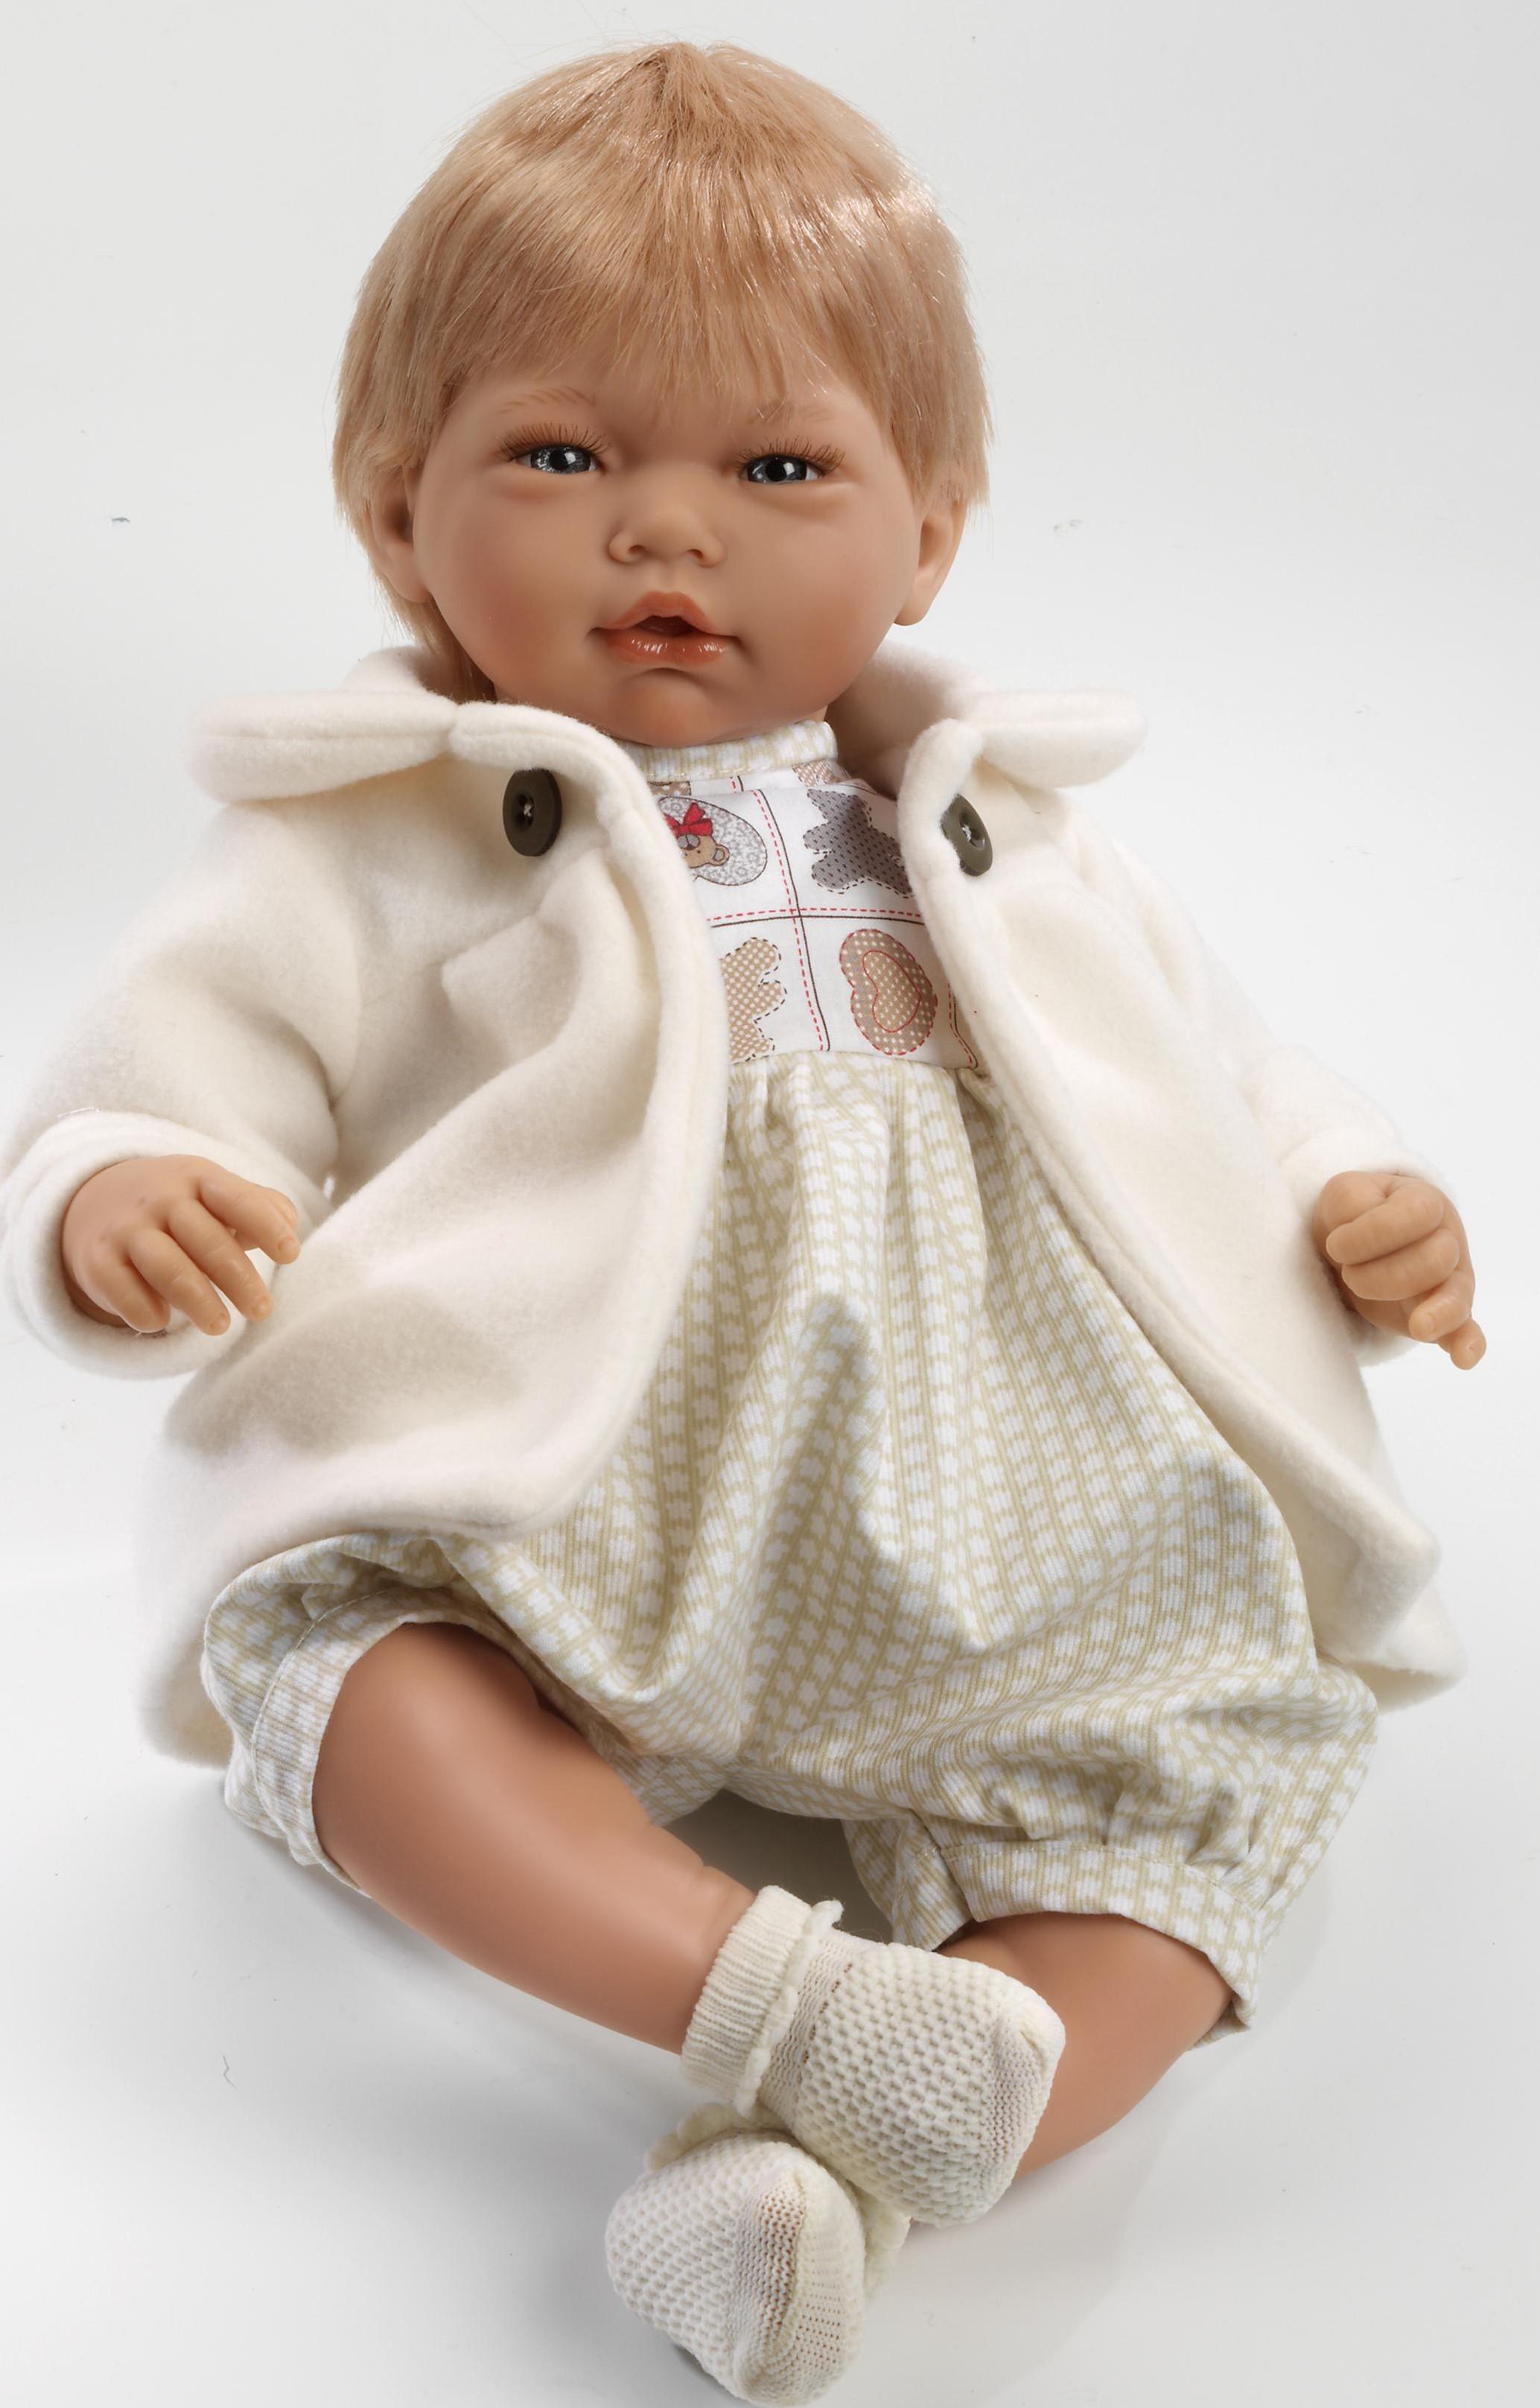 Realistické miminko - chlapeček Adrián v bílém kabátku od f. Guca ze Španělska (Doprava zdarma)